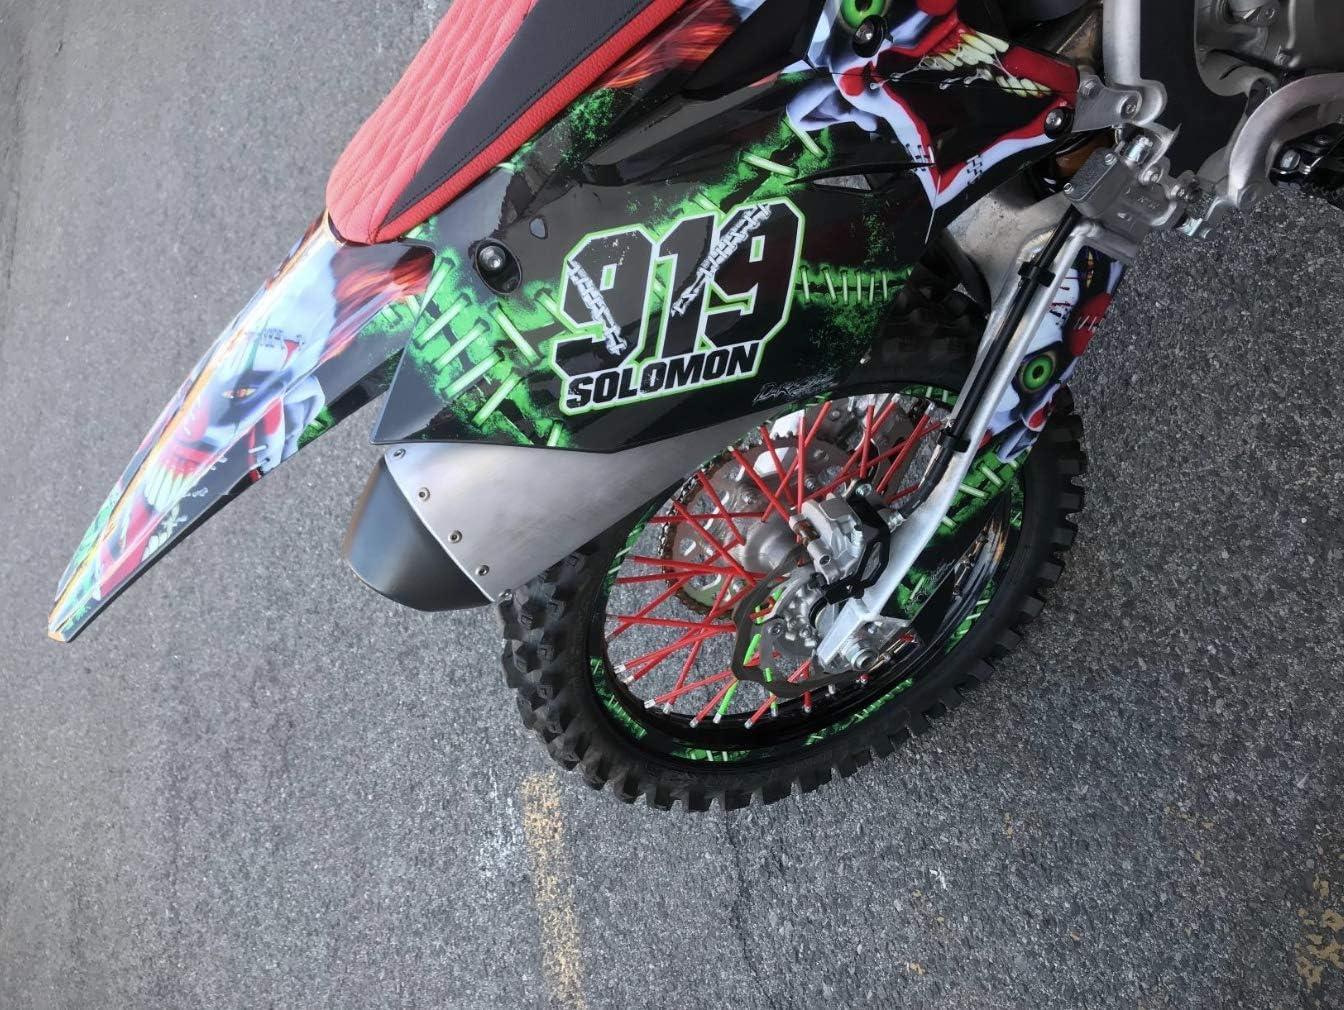 YUANXU Bicycle Spoke Skin Coats Covers Wraps 8-21 Rims for Motorcycle Dirt Bike Kawasaki Honda Suzuki Colorful Wheel Decoration-72 pcs